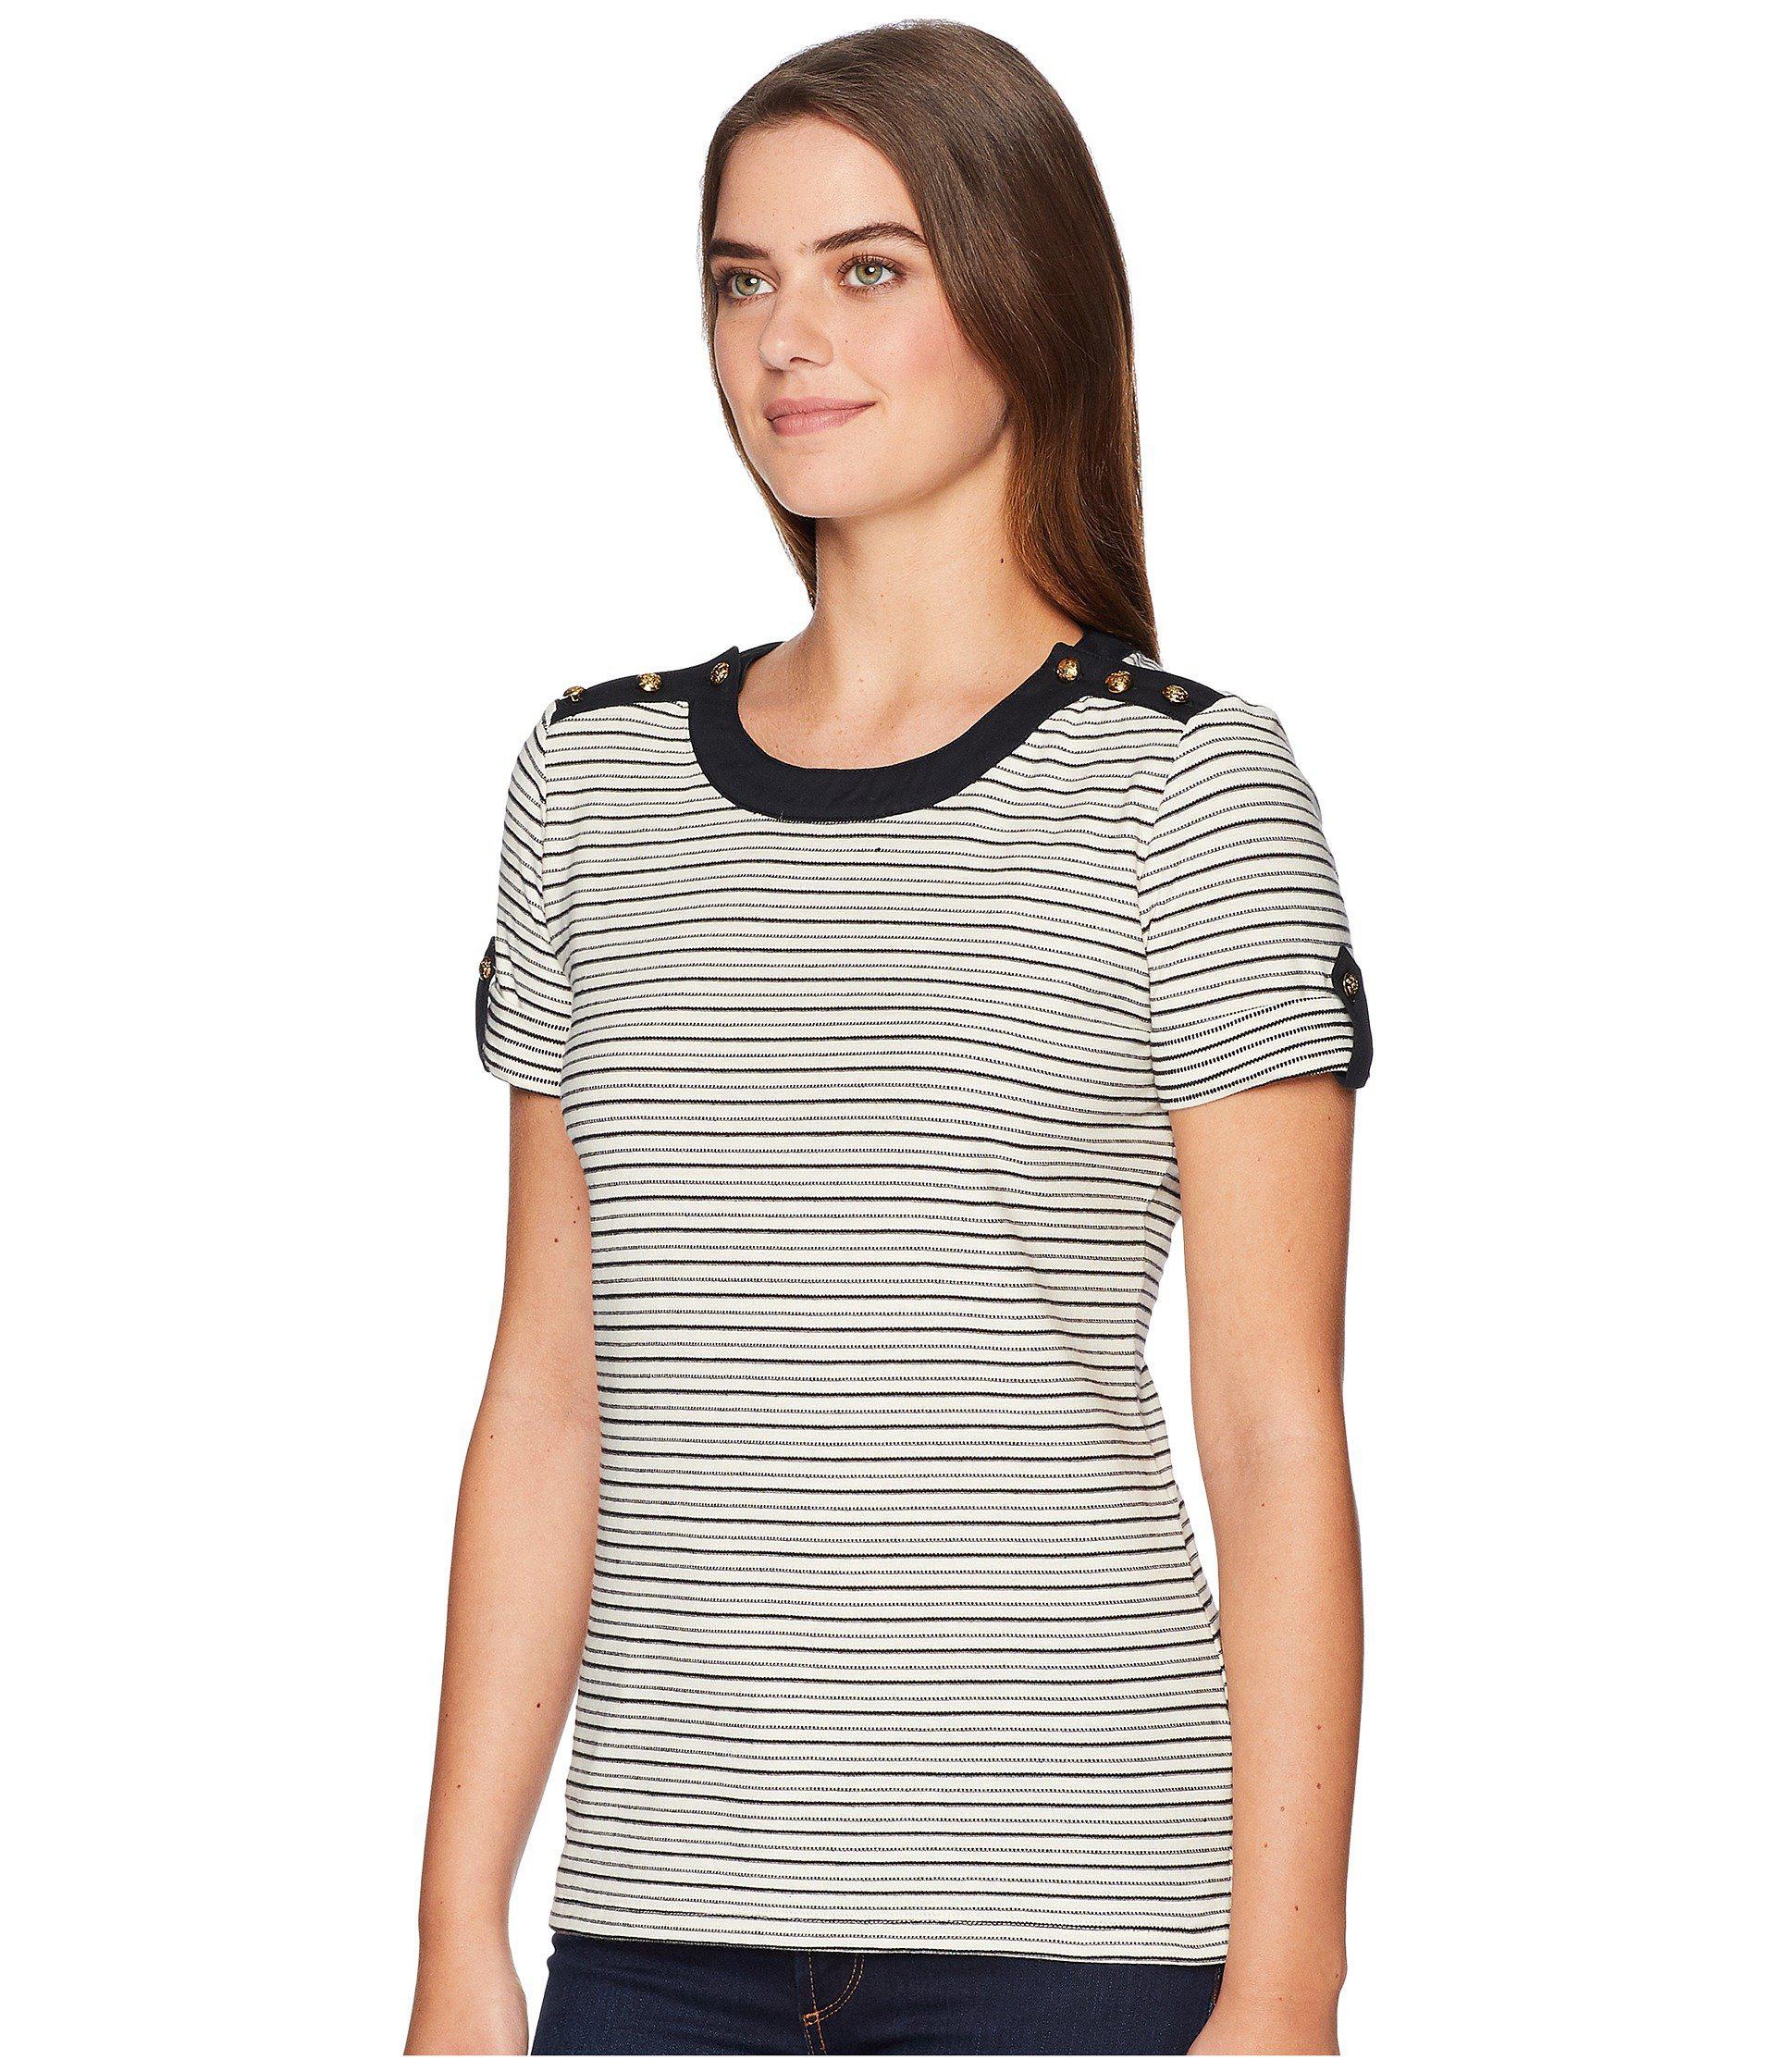 7d822c73 Lyst - Lauren by Ralph Lauren Striped Button-shoulder Top in Black - Save  59%